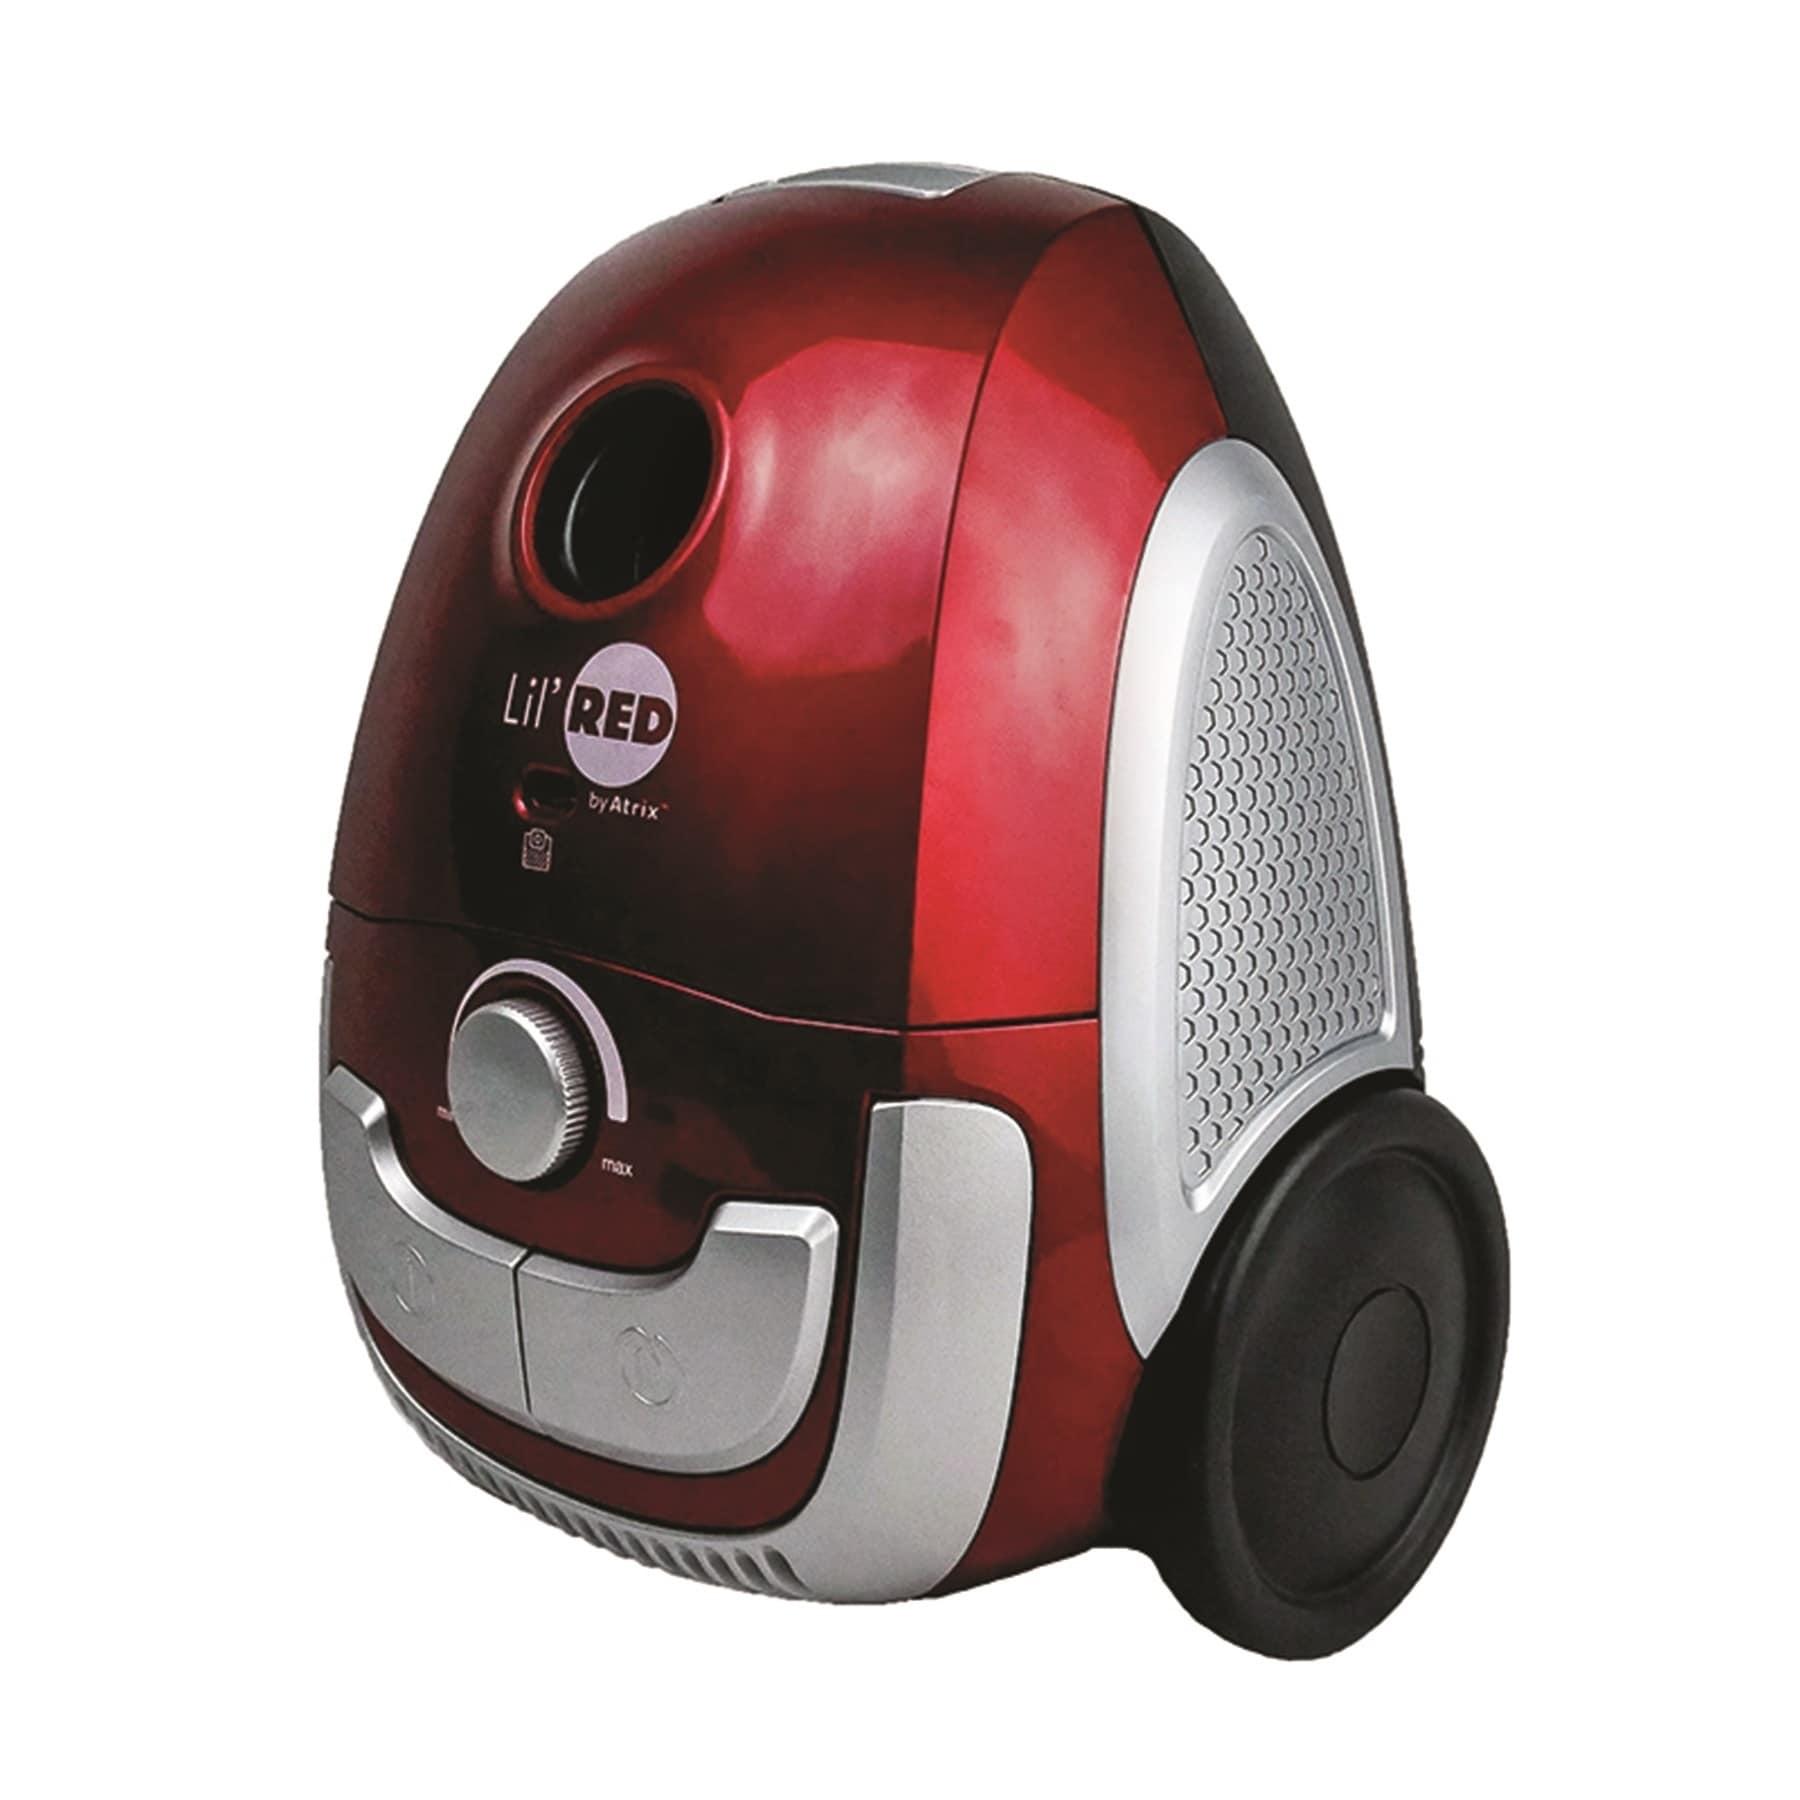 ATRIX Lil' Red Hepa Canister Vacuum, Black